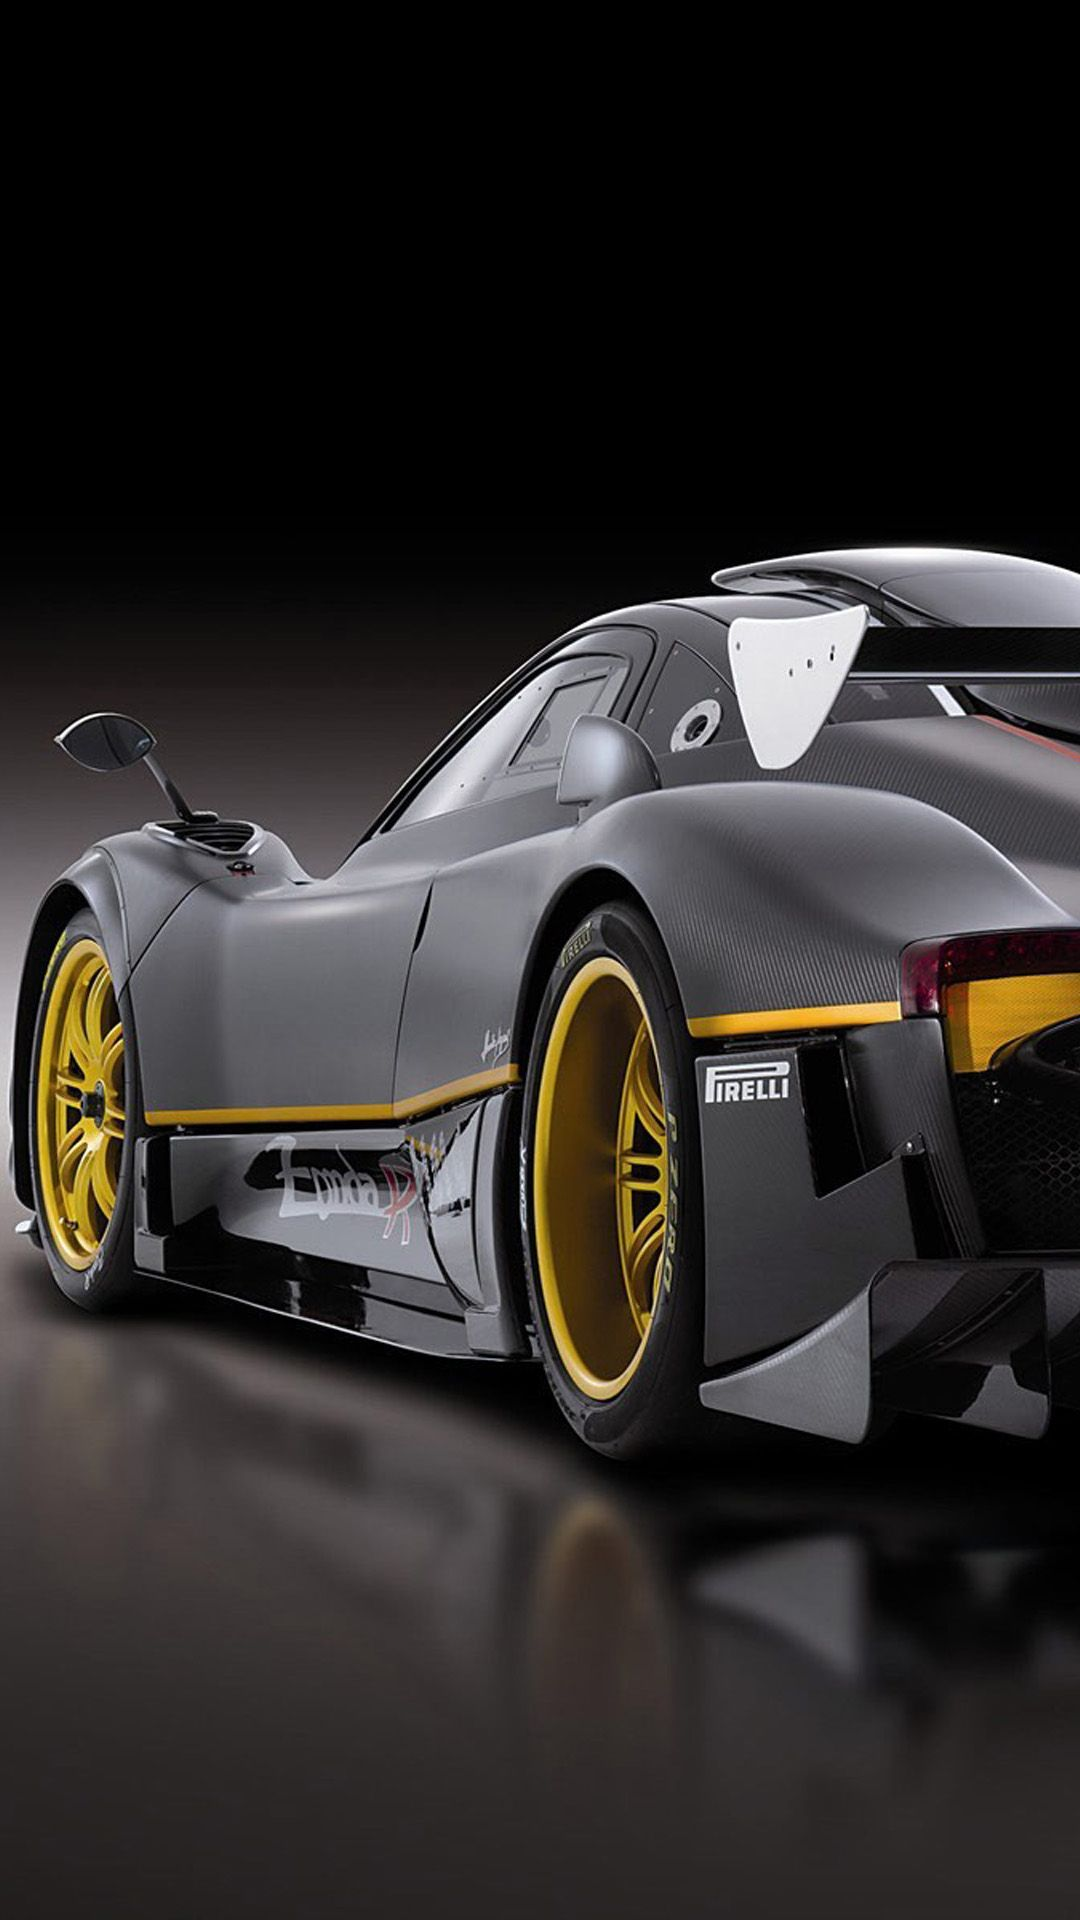 Super Car Wallpapers - Top Free Super Car Backgrounds ...